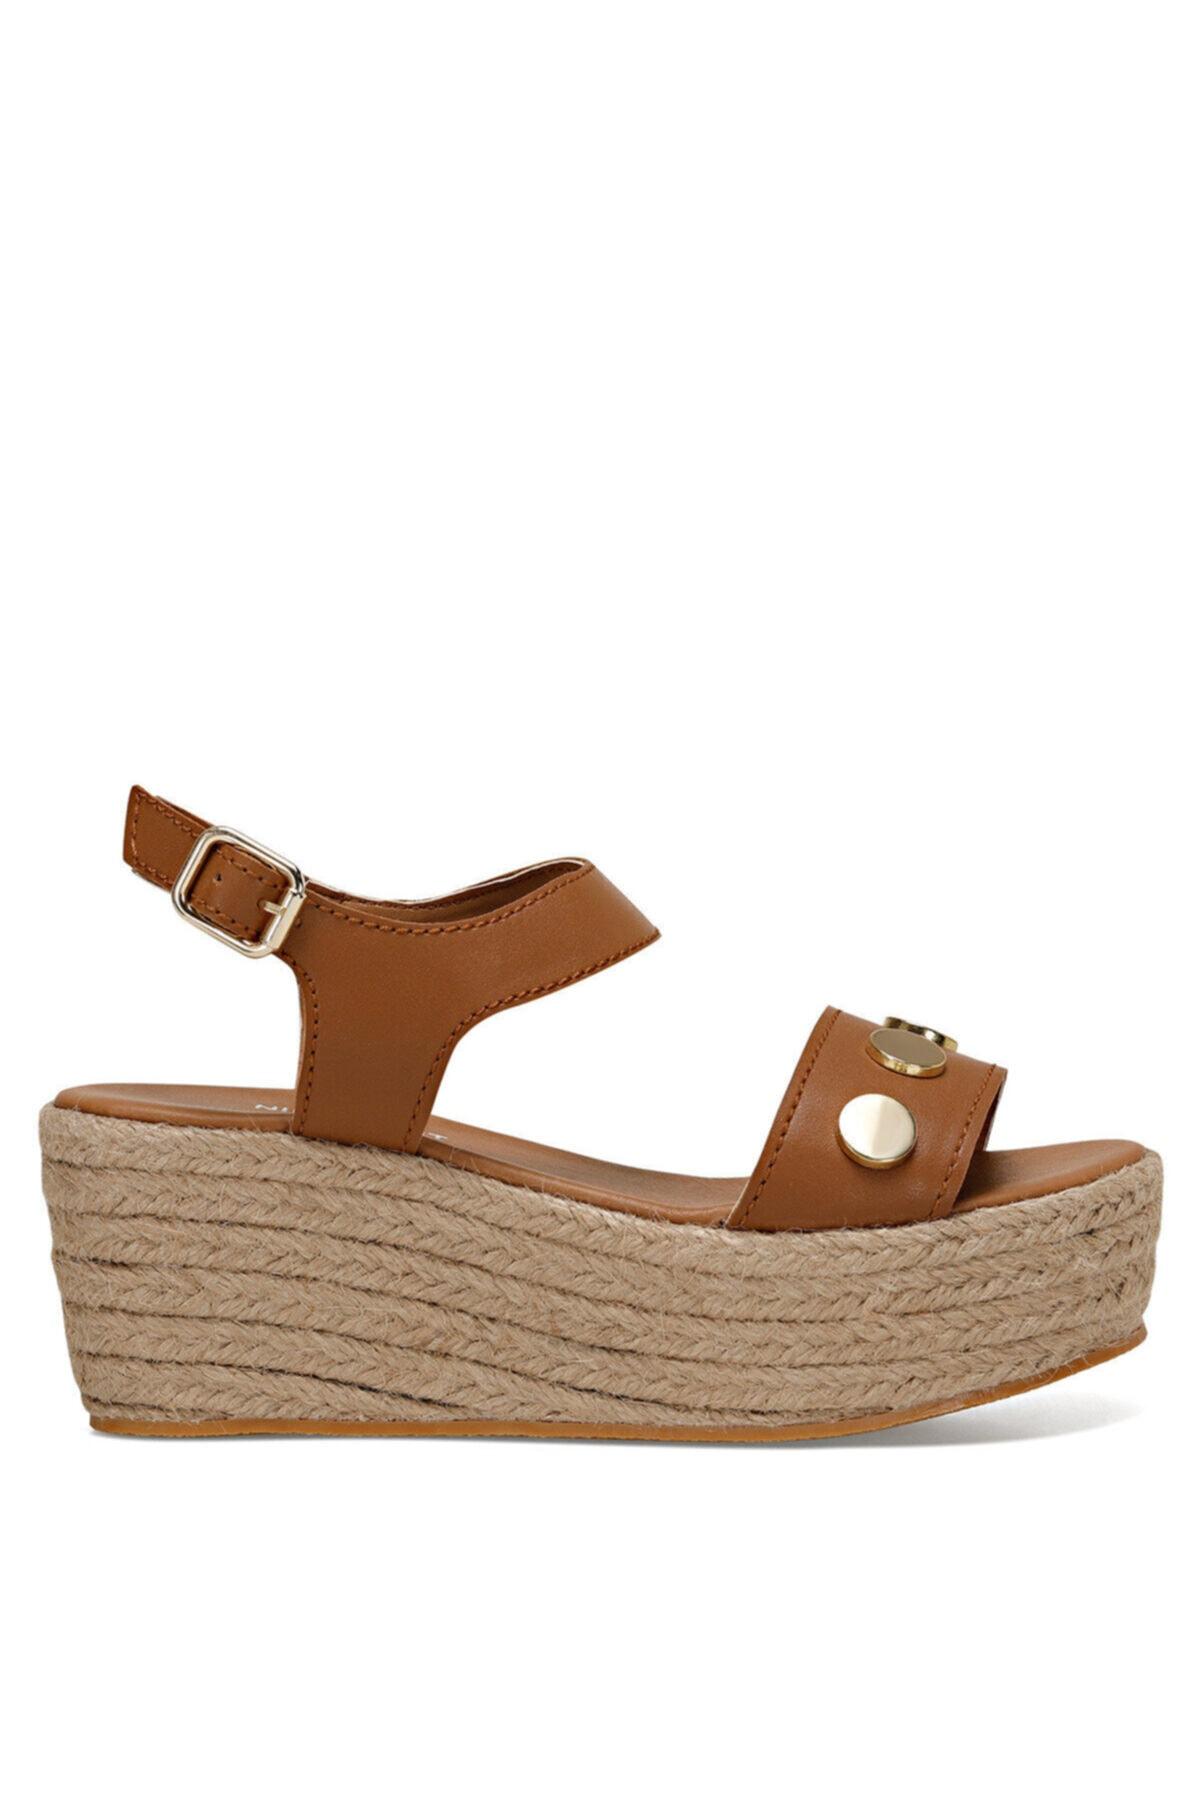 Nine West Valadon Taba Kadın Dolgu Topuklu Sandalet 1